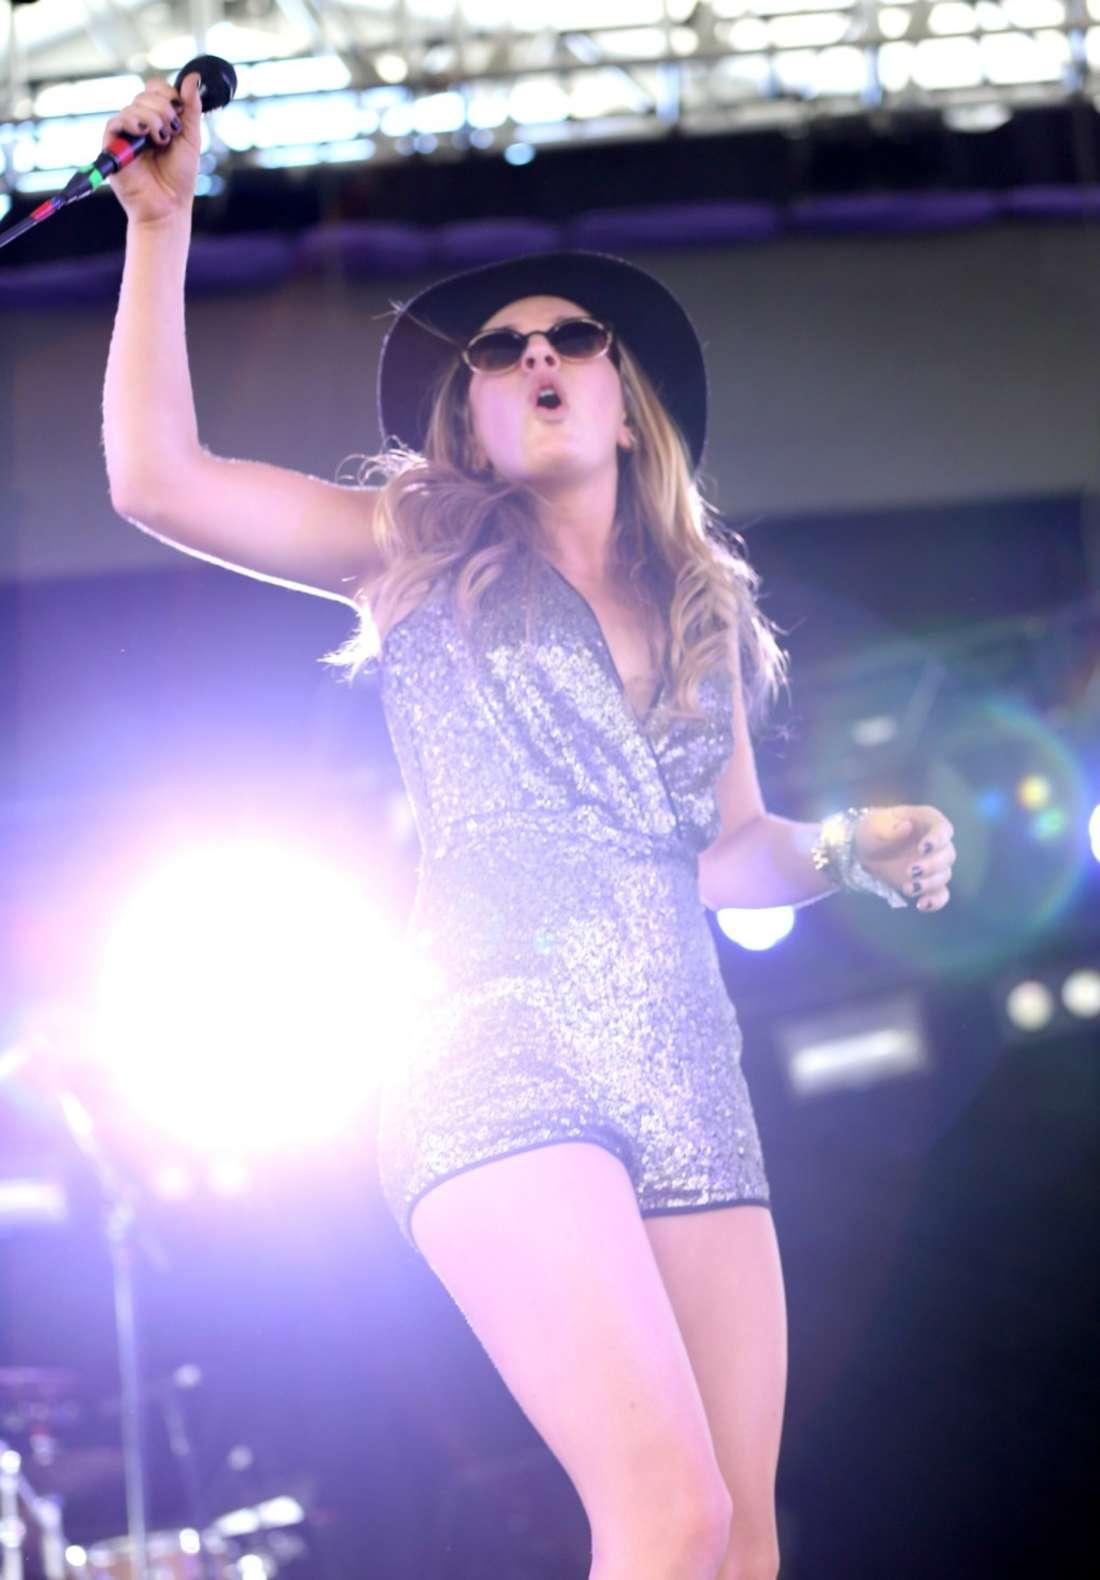 ZZ Ward Performing at the Coachella